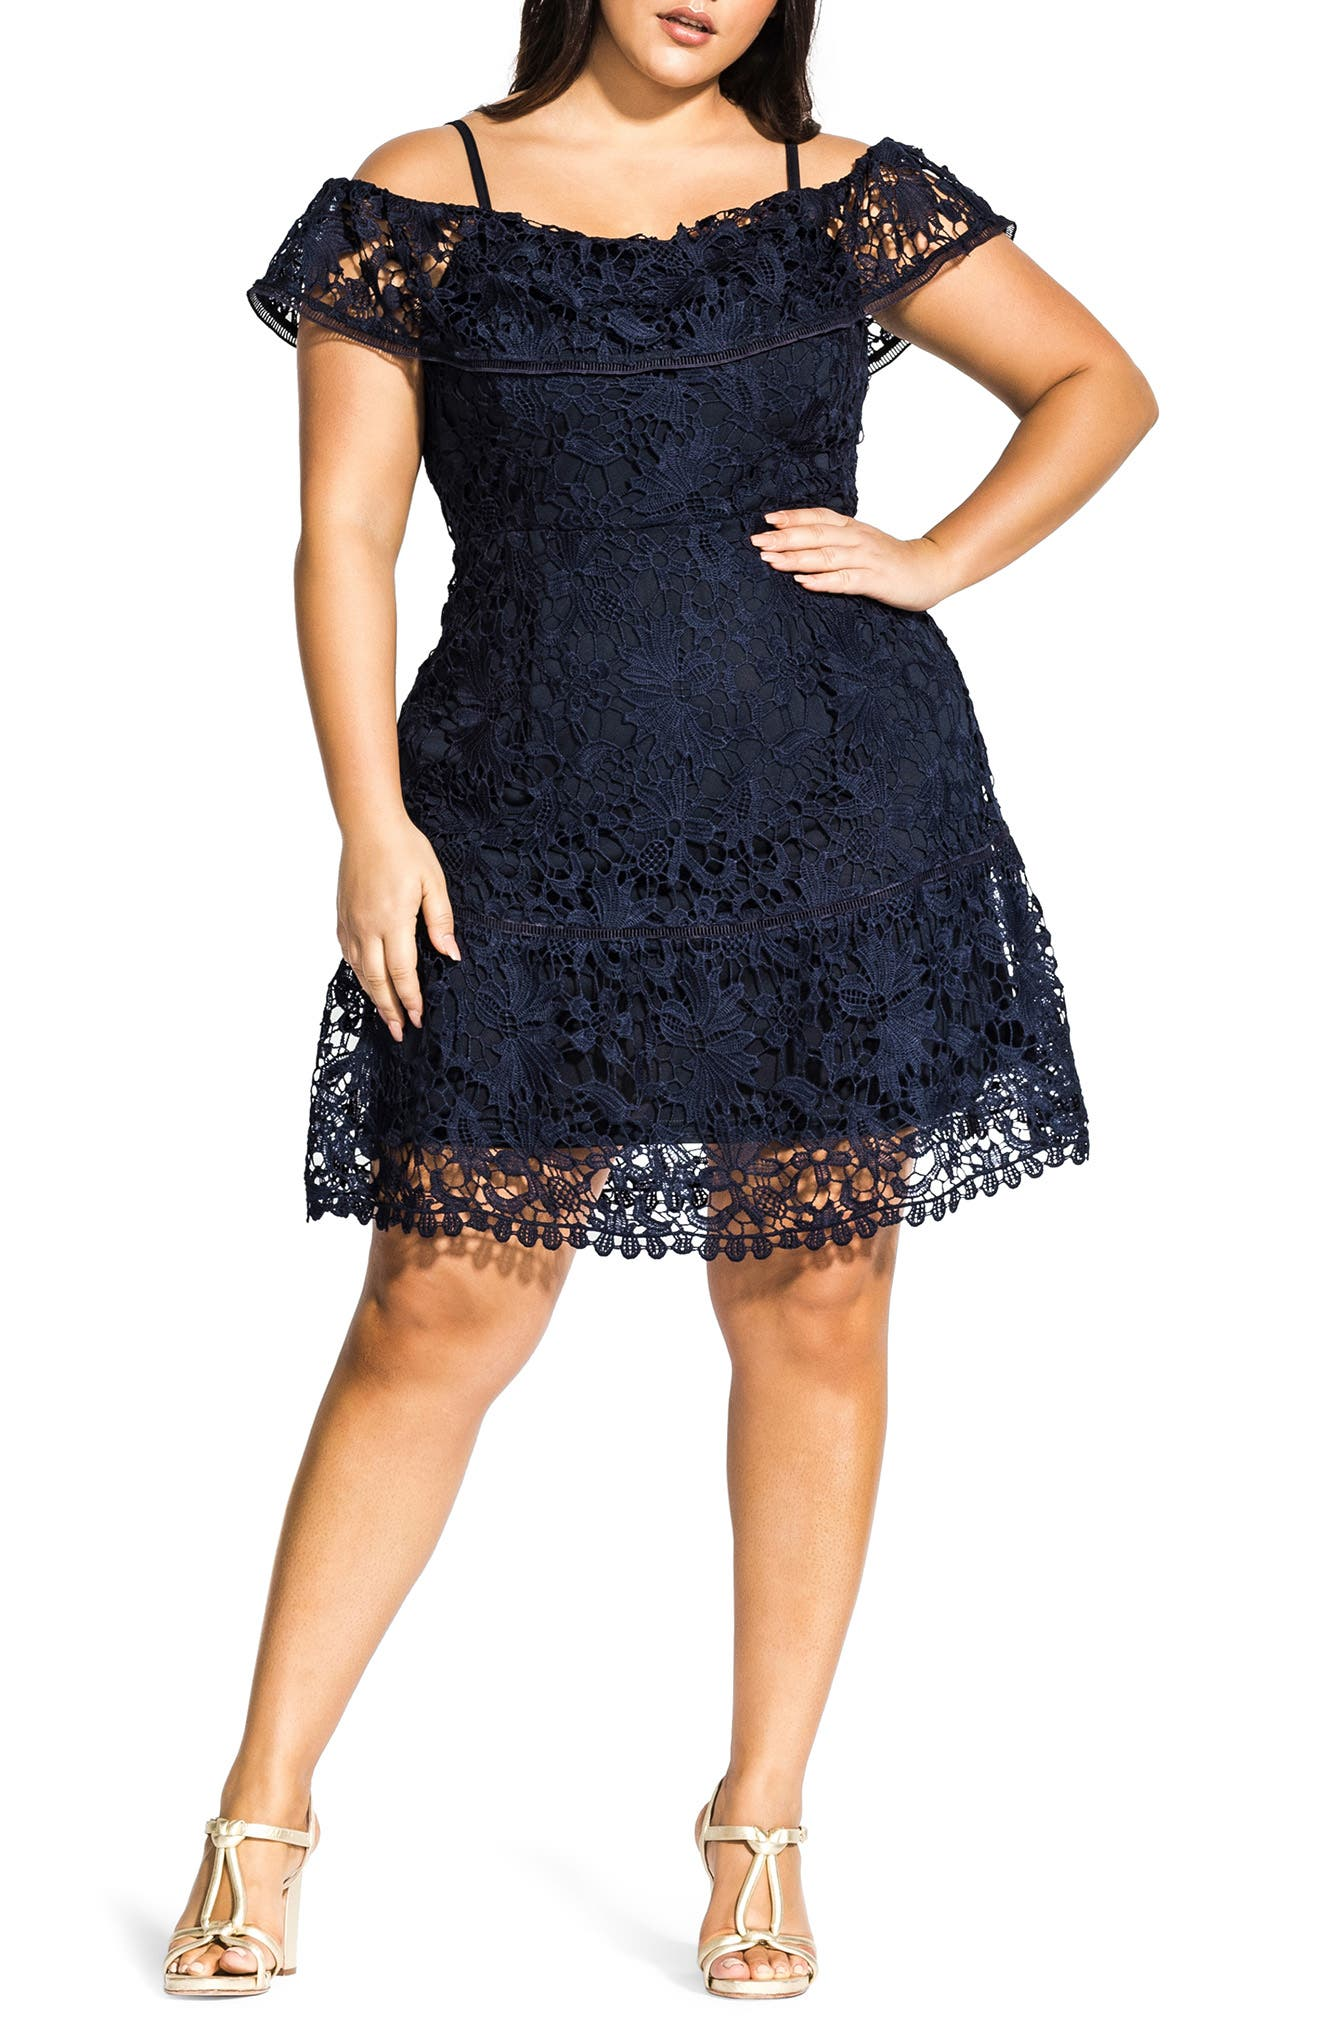 Plus Size City Chic Dreams Of Lace Fit & Flare Dress, Blue